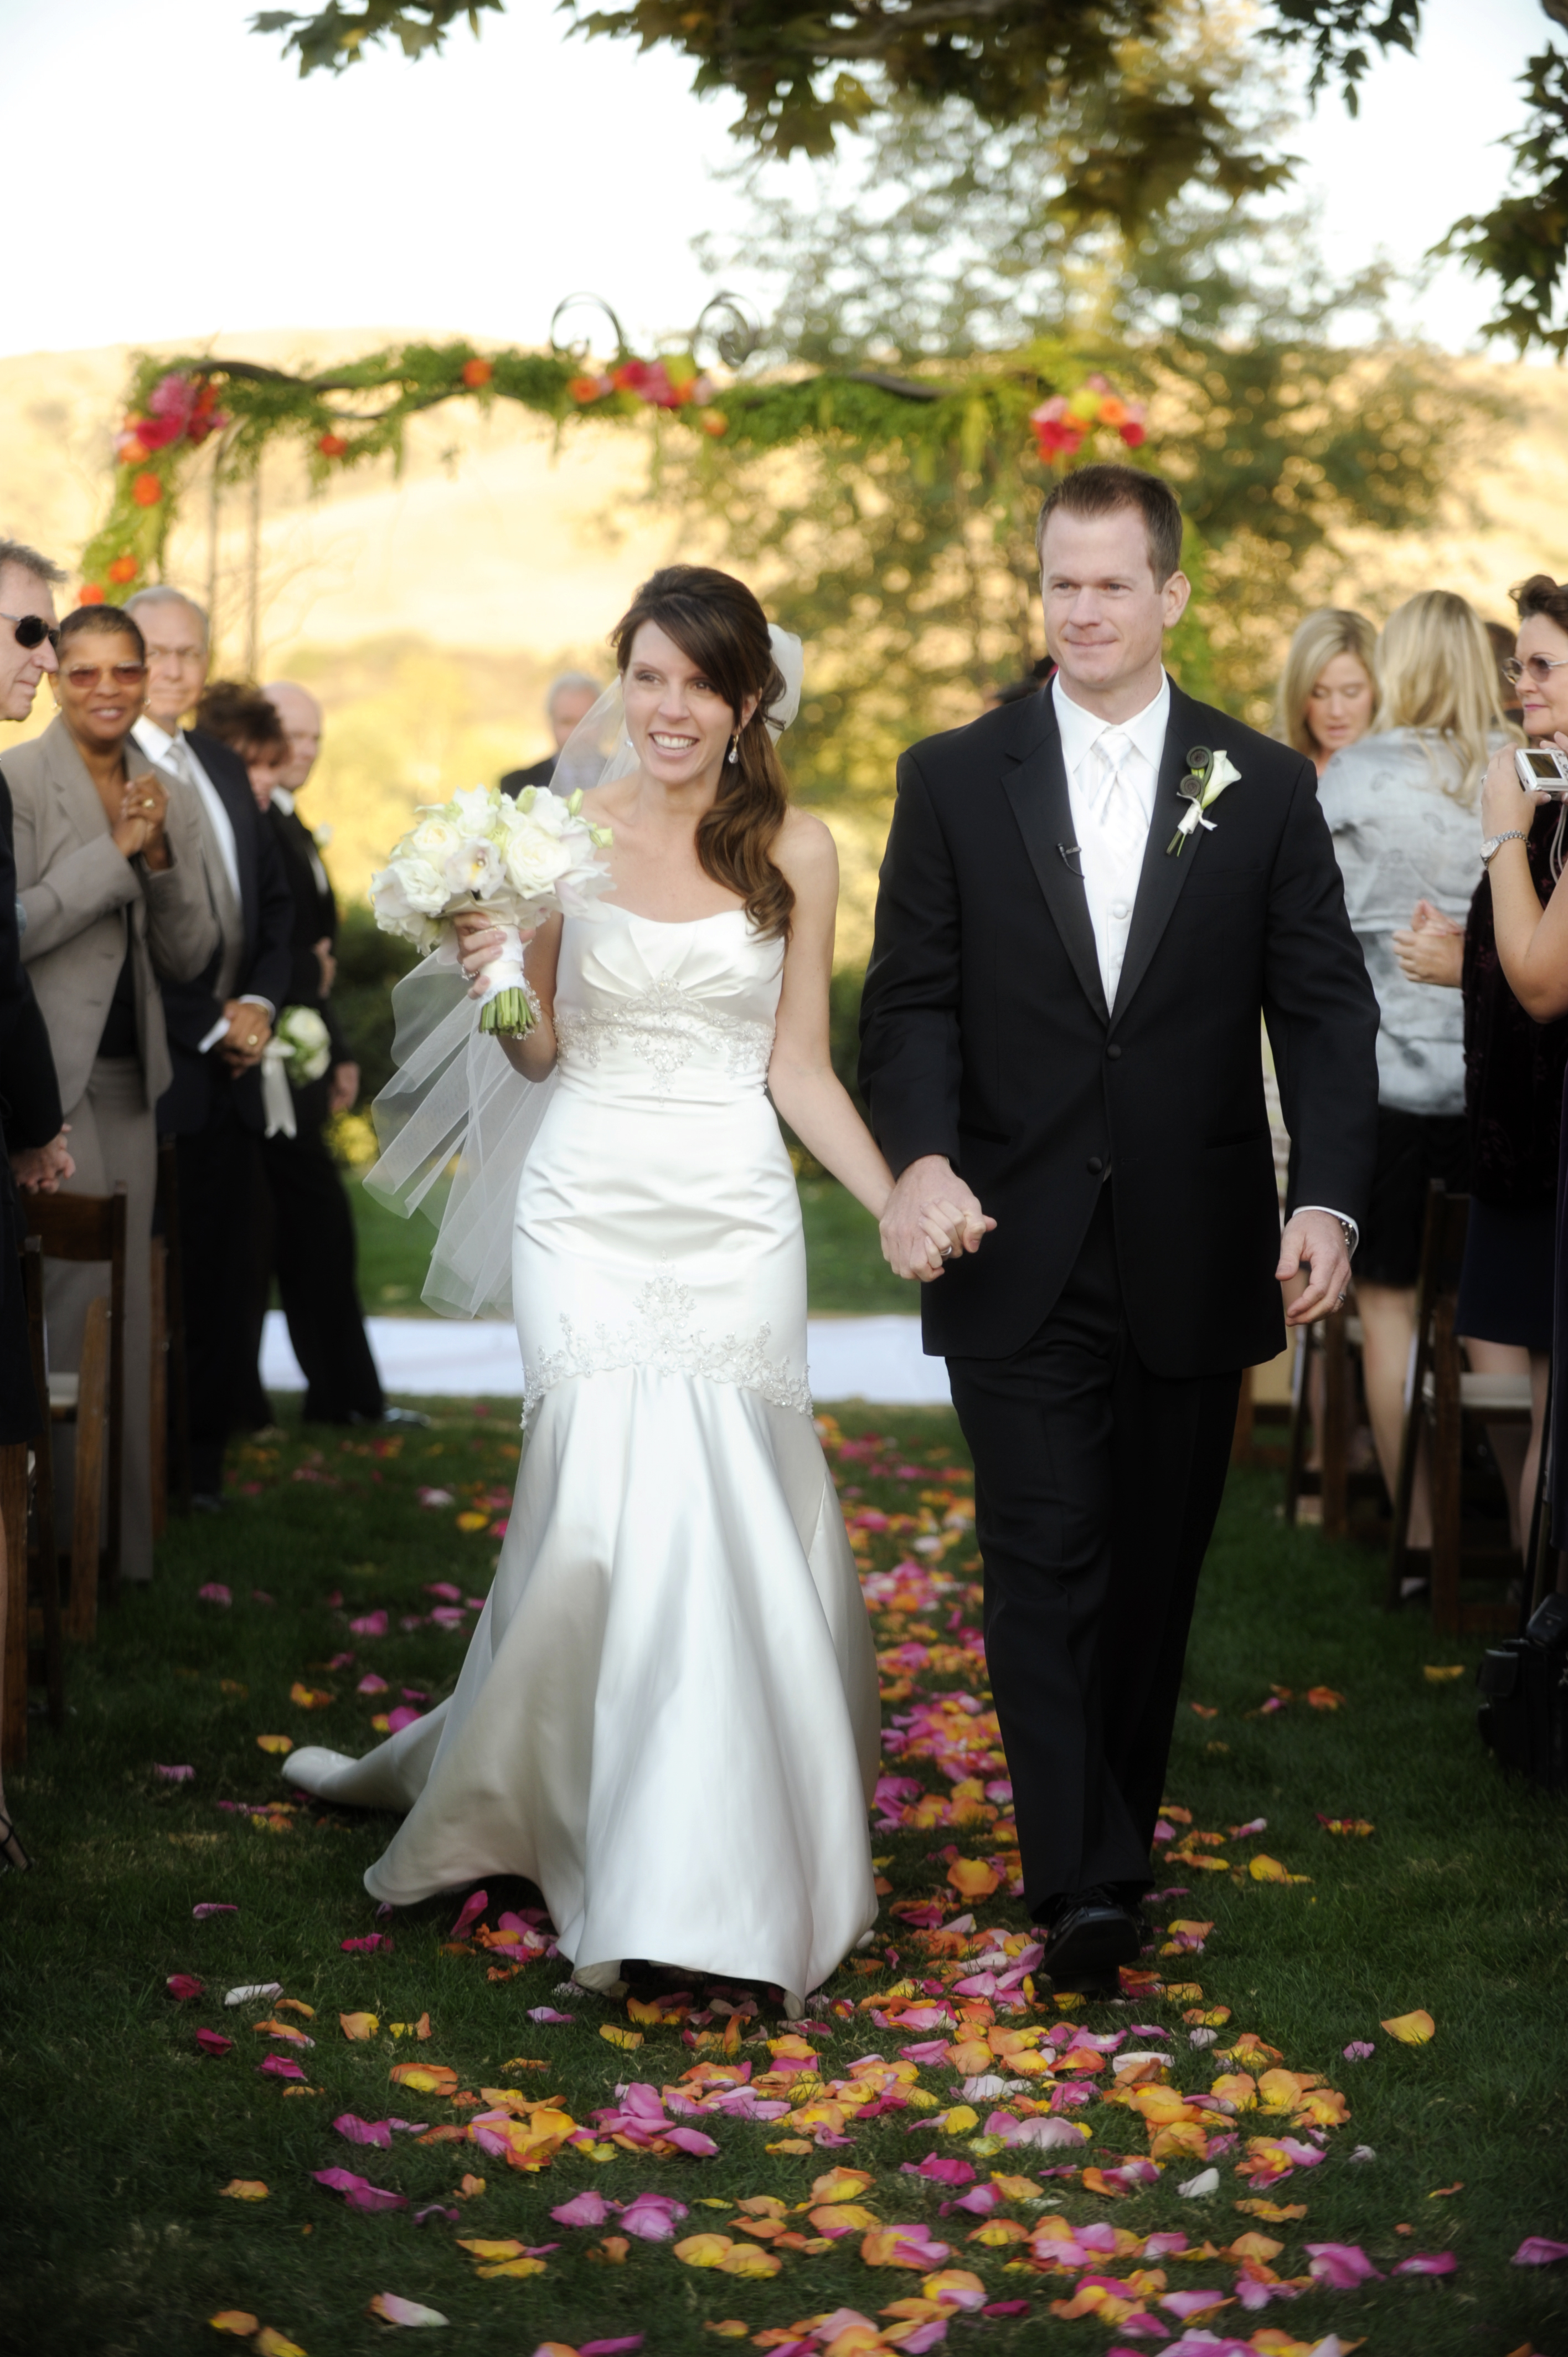 Flowers & Decor, Wedding Dresses, Mermaid Wedding Dresses, Fashion, orange, pink, dress, Centerpieces, Flowers, Centerpiece, Mermaid, Strapless, Strapless Wedding Dresses, Flower Wedding Dresses